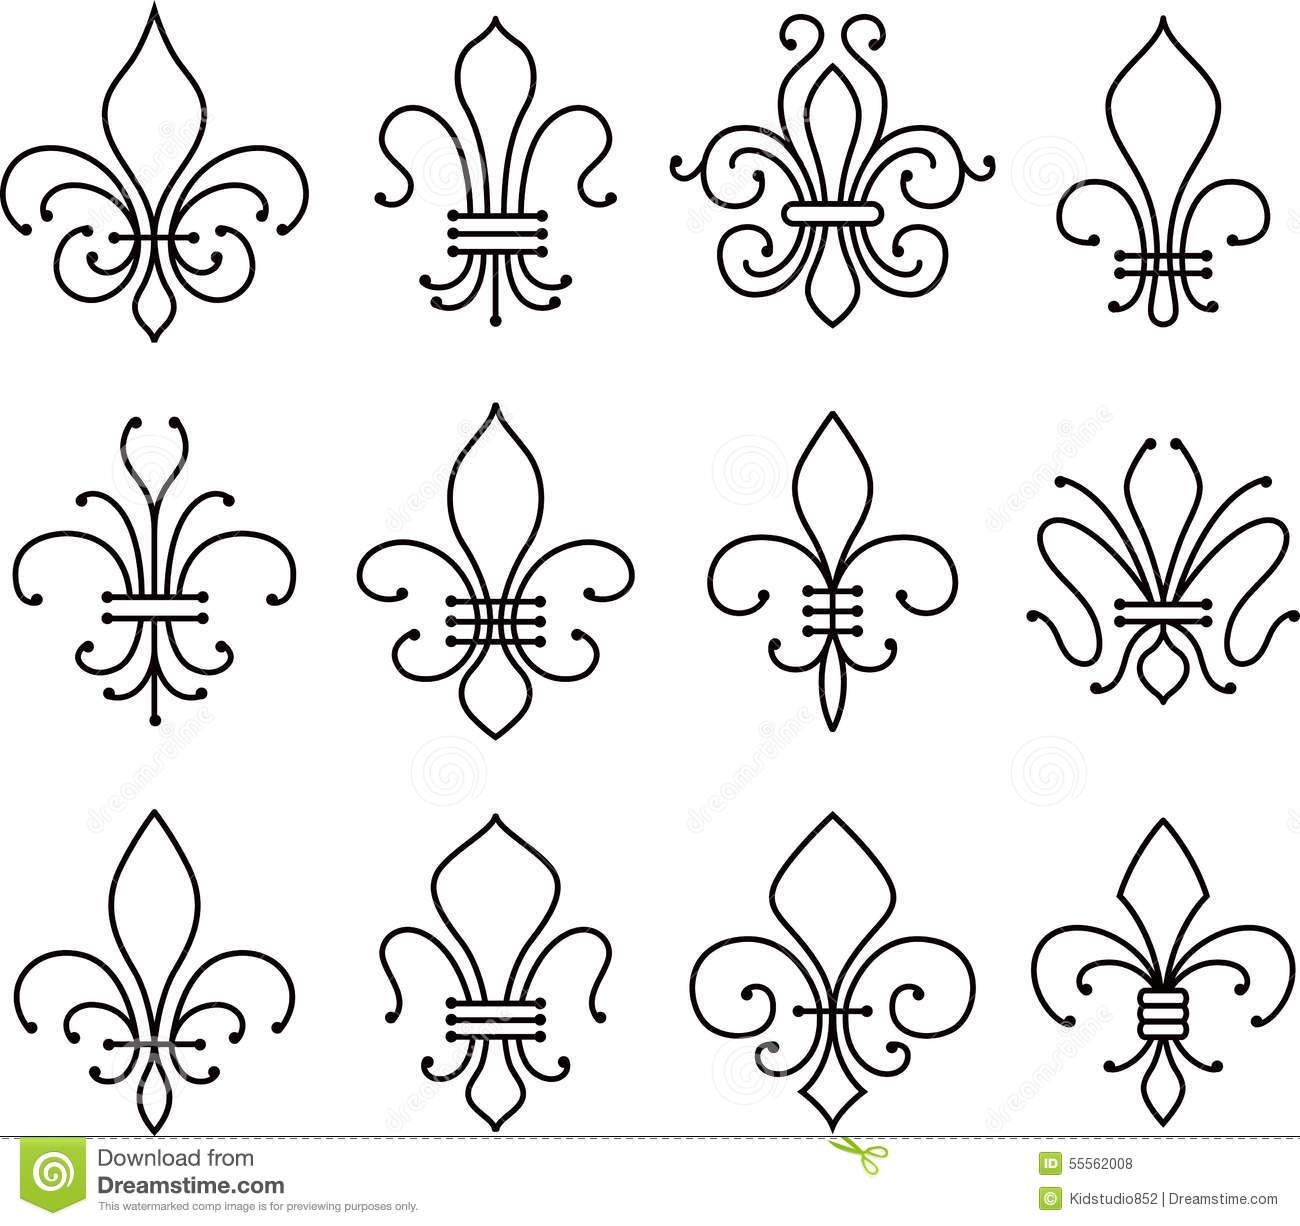 fleur-de-lys-scroll-elements-symbol-set-55562008.jpg